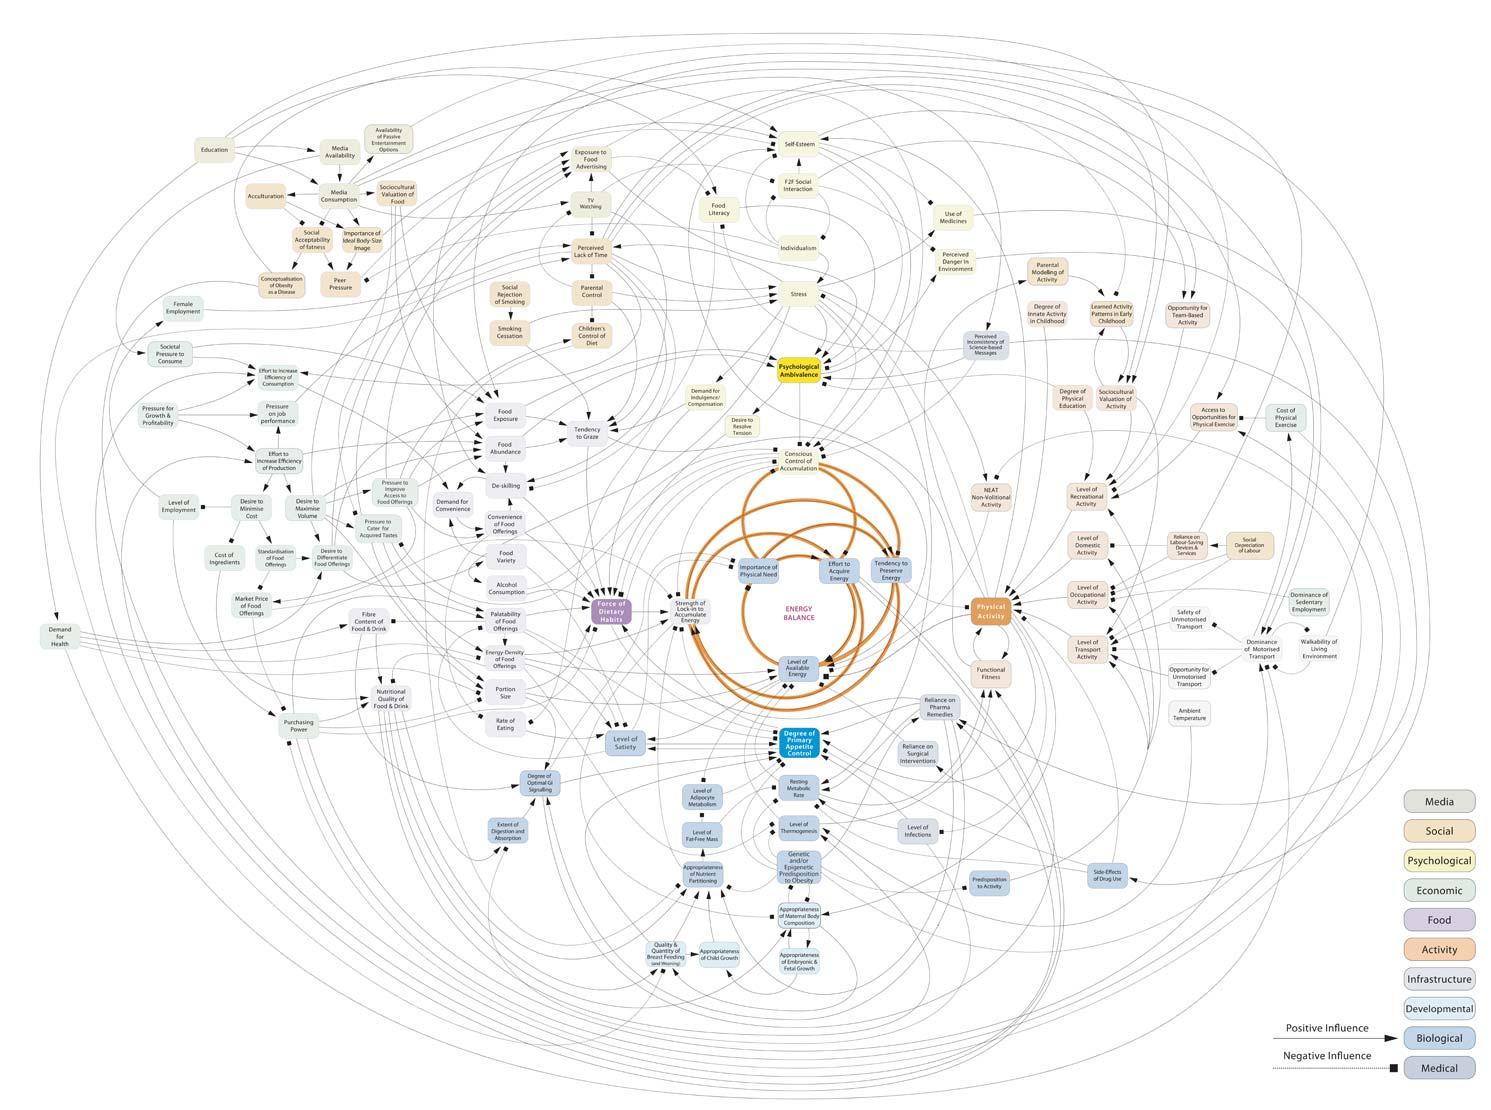 Obesidade Mapa - Foresight - Tackling obesities: future choices